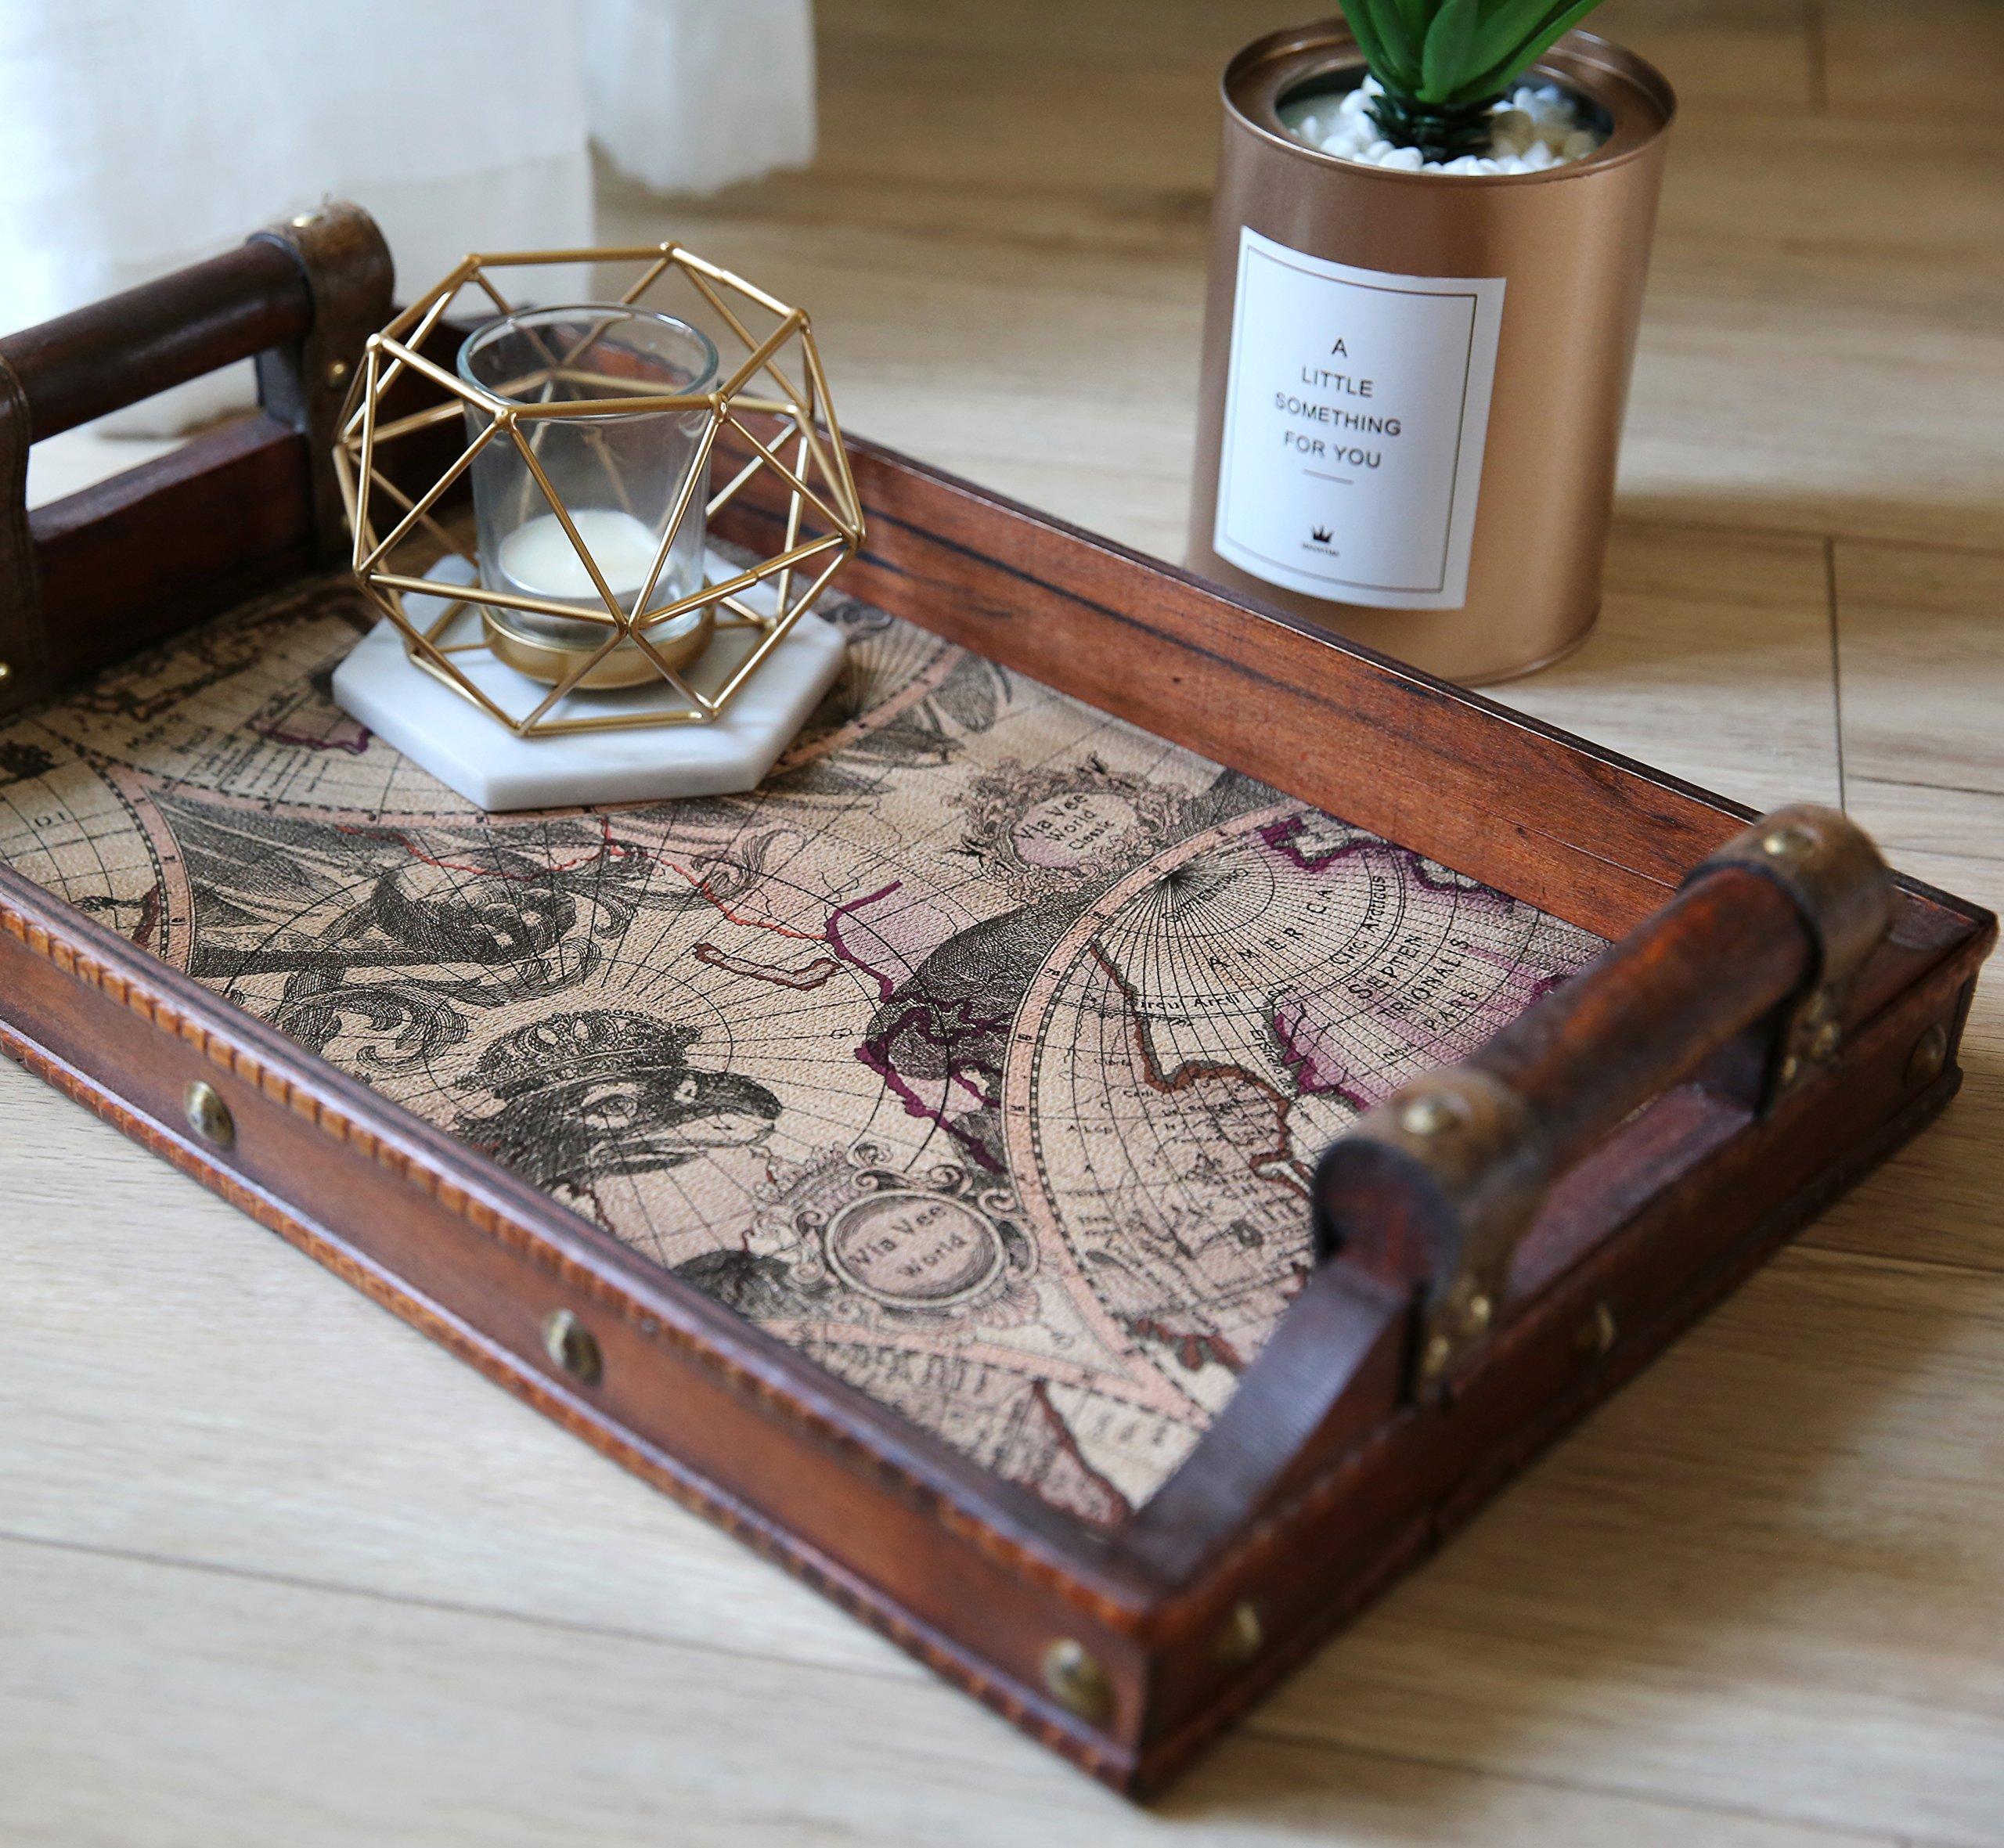 SLPR Worldly Wooden Designer Serving Tray Set with Handles (Set of 2) | Wood Nesting Rectangular Travel Themed Butler Breakfast Vintage Style Serving Tray by SLPR (Image #5)